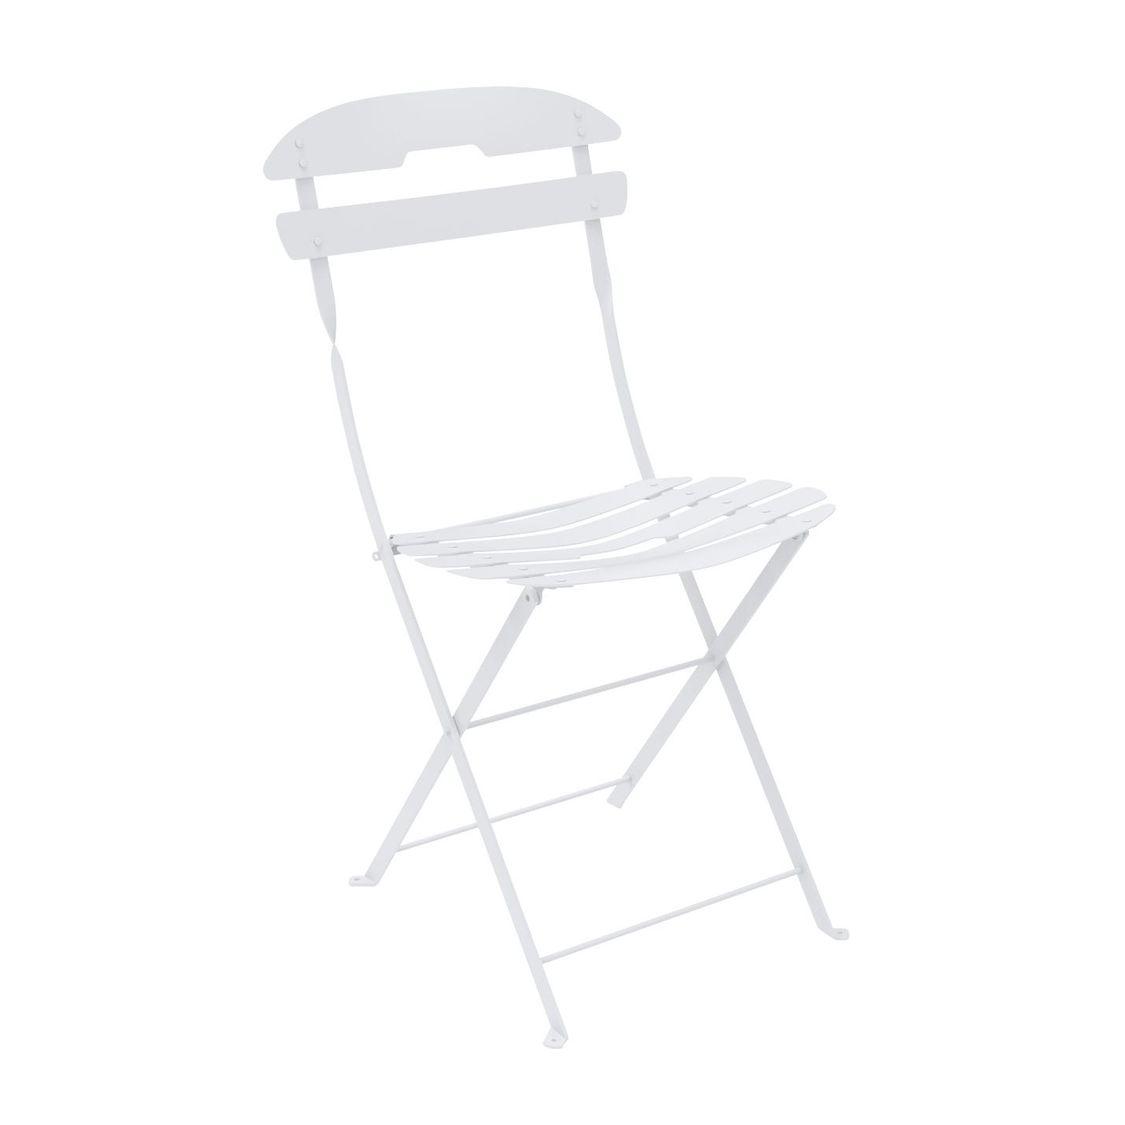 1125x1125 La Mome Garden Chair Folding Chair Fermob